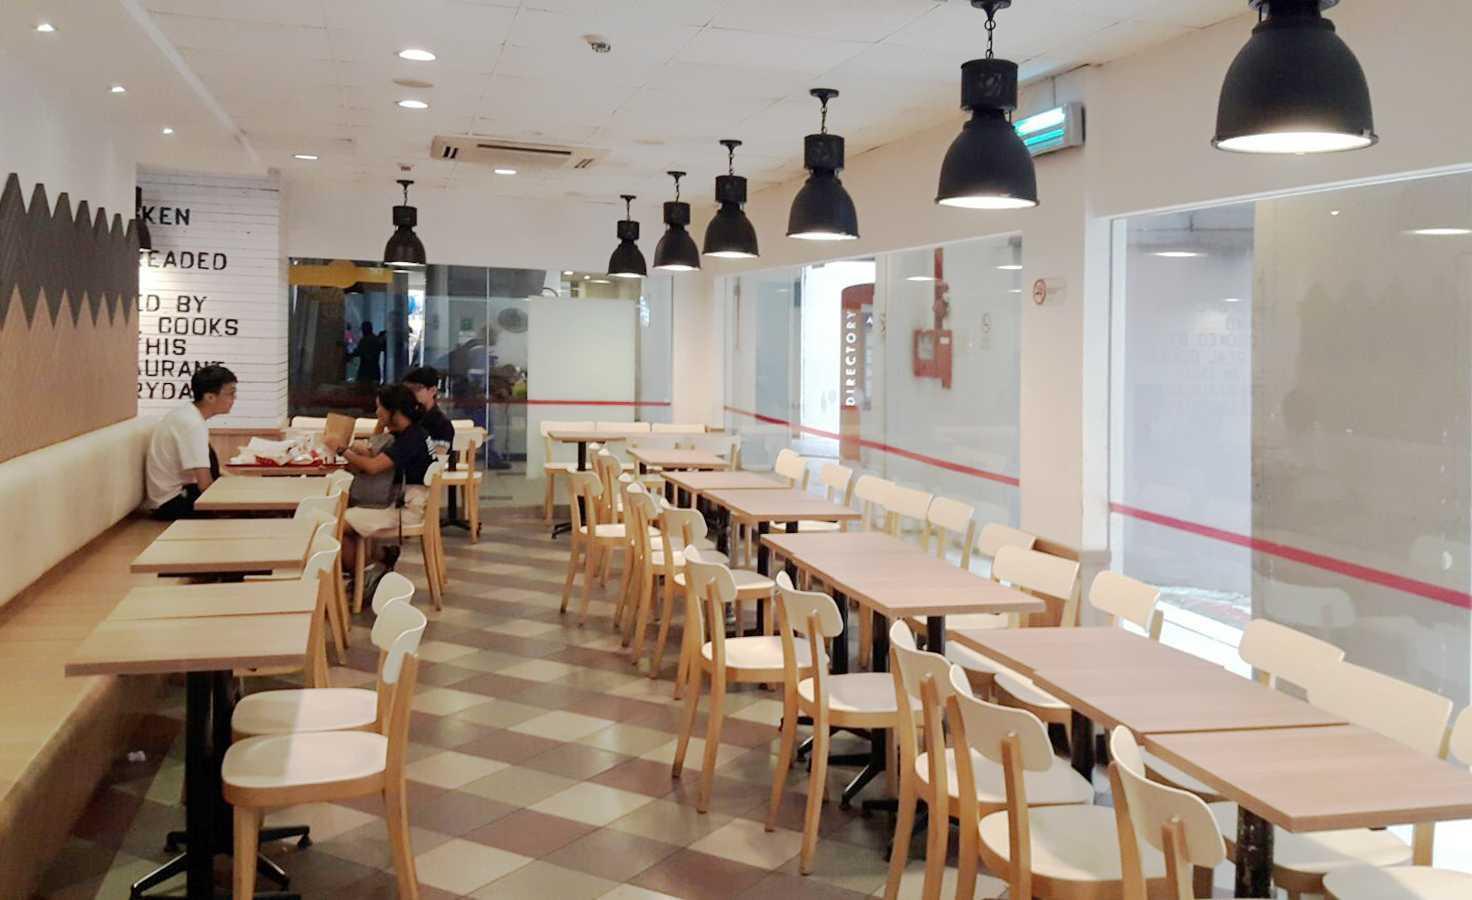 Minimmax Interiors Pte Ltd Kfc Admiralty Place Woodlands Ave 6, Singapura Woodlands Ave 6, Singapura Seating Area Interior View Kontemporer  38535